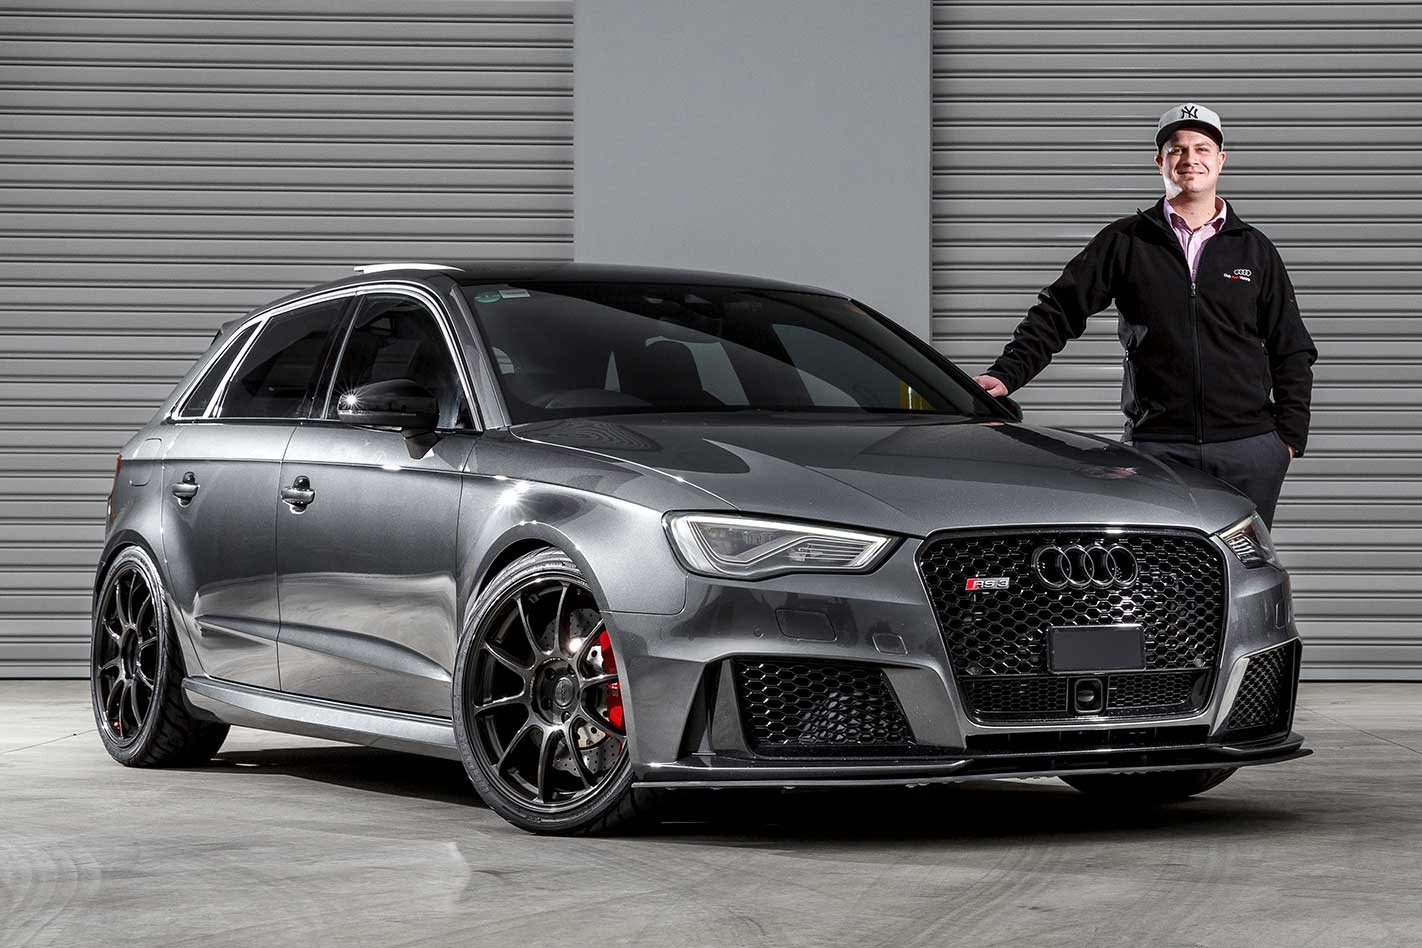 Kelebihan Kekurangan Audi Rs3 Sportback Top Model Tahun Ini